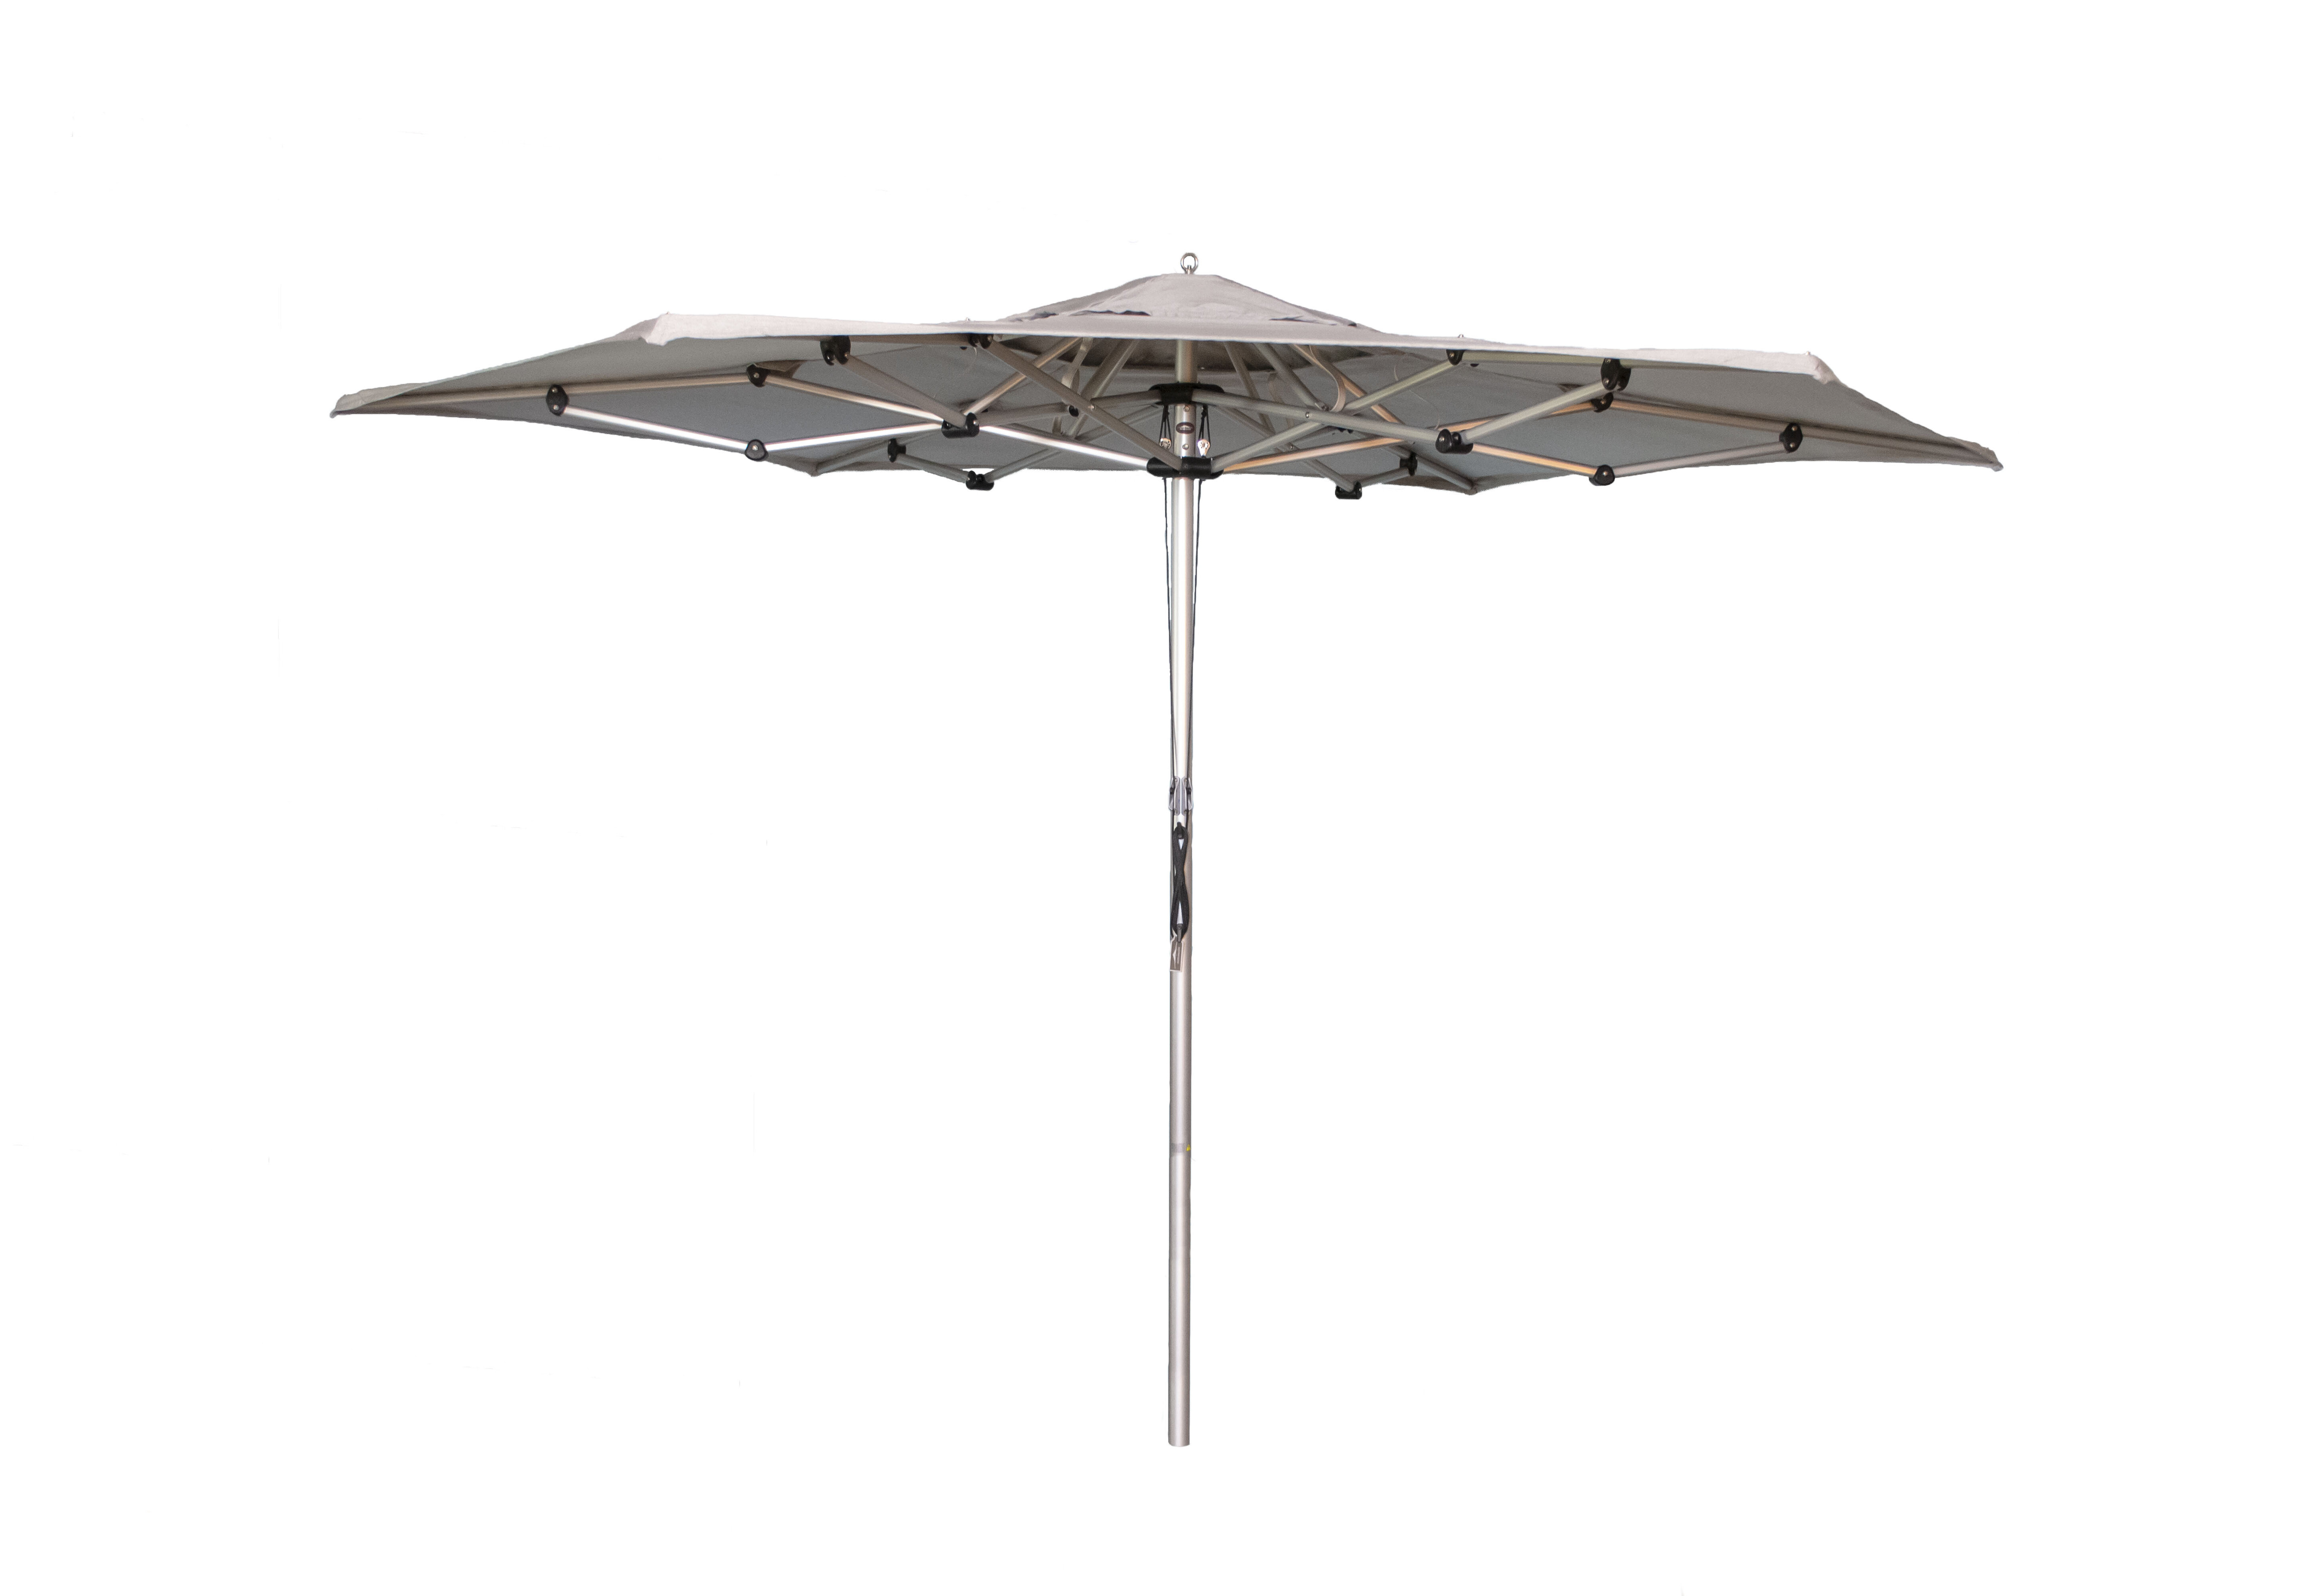 Preferred Lennie Cantilever Sunbrella Umbrellas Inside Baden 11' Market Sunbrella Umbrella (View 15 of 20)